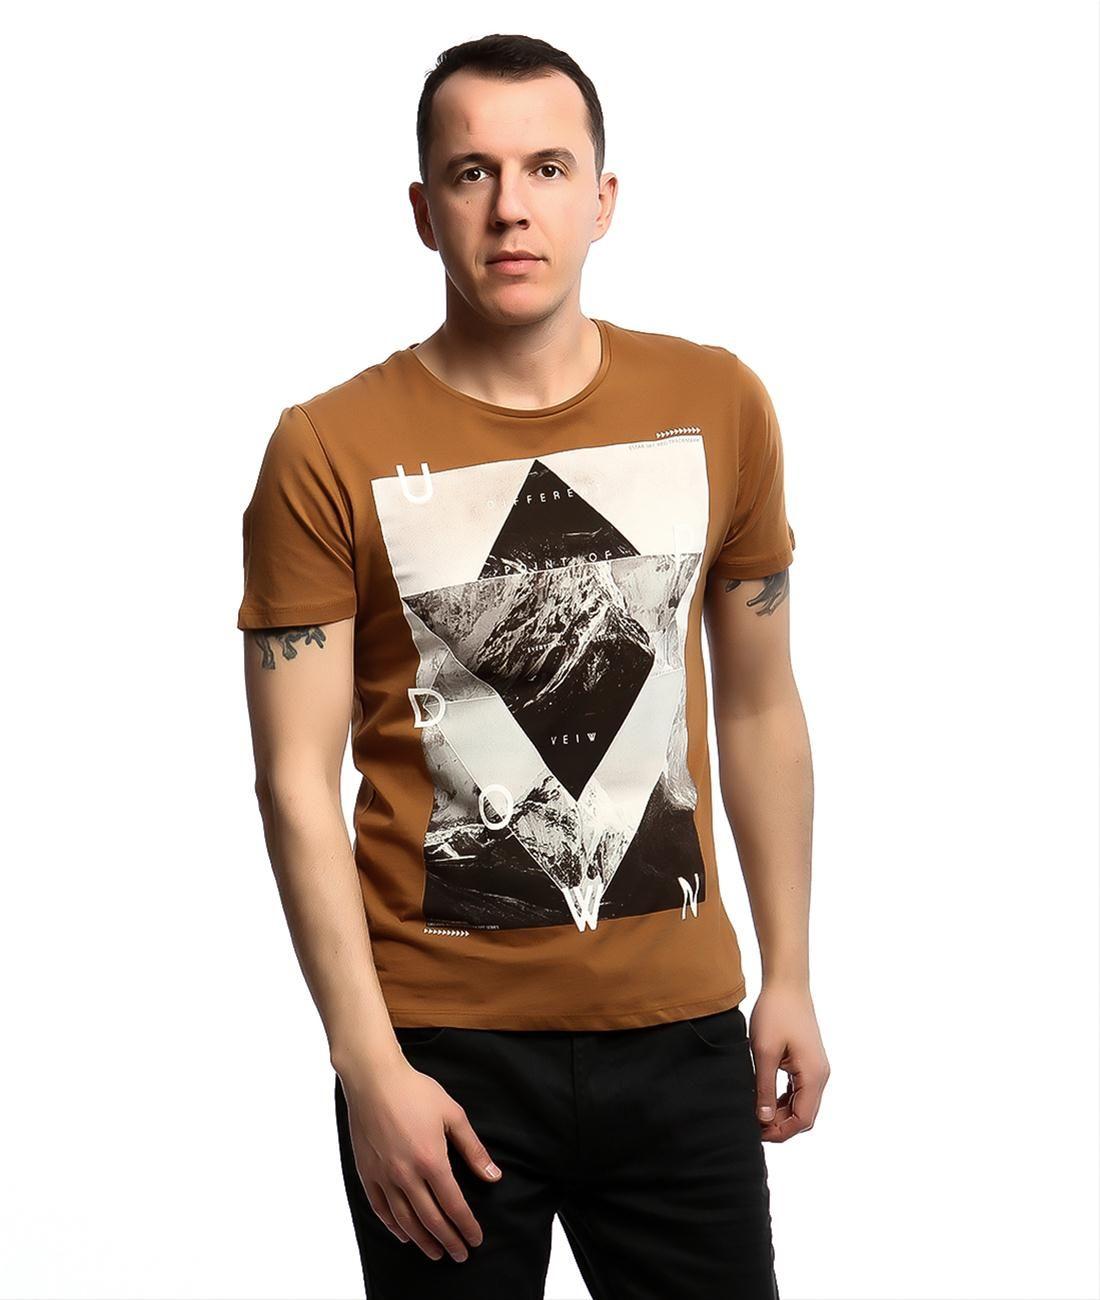 Collezione T Shirt Kisa Kol Hardal Giyim Hardal Kis